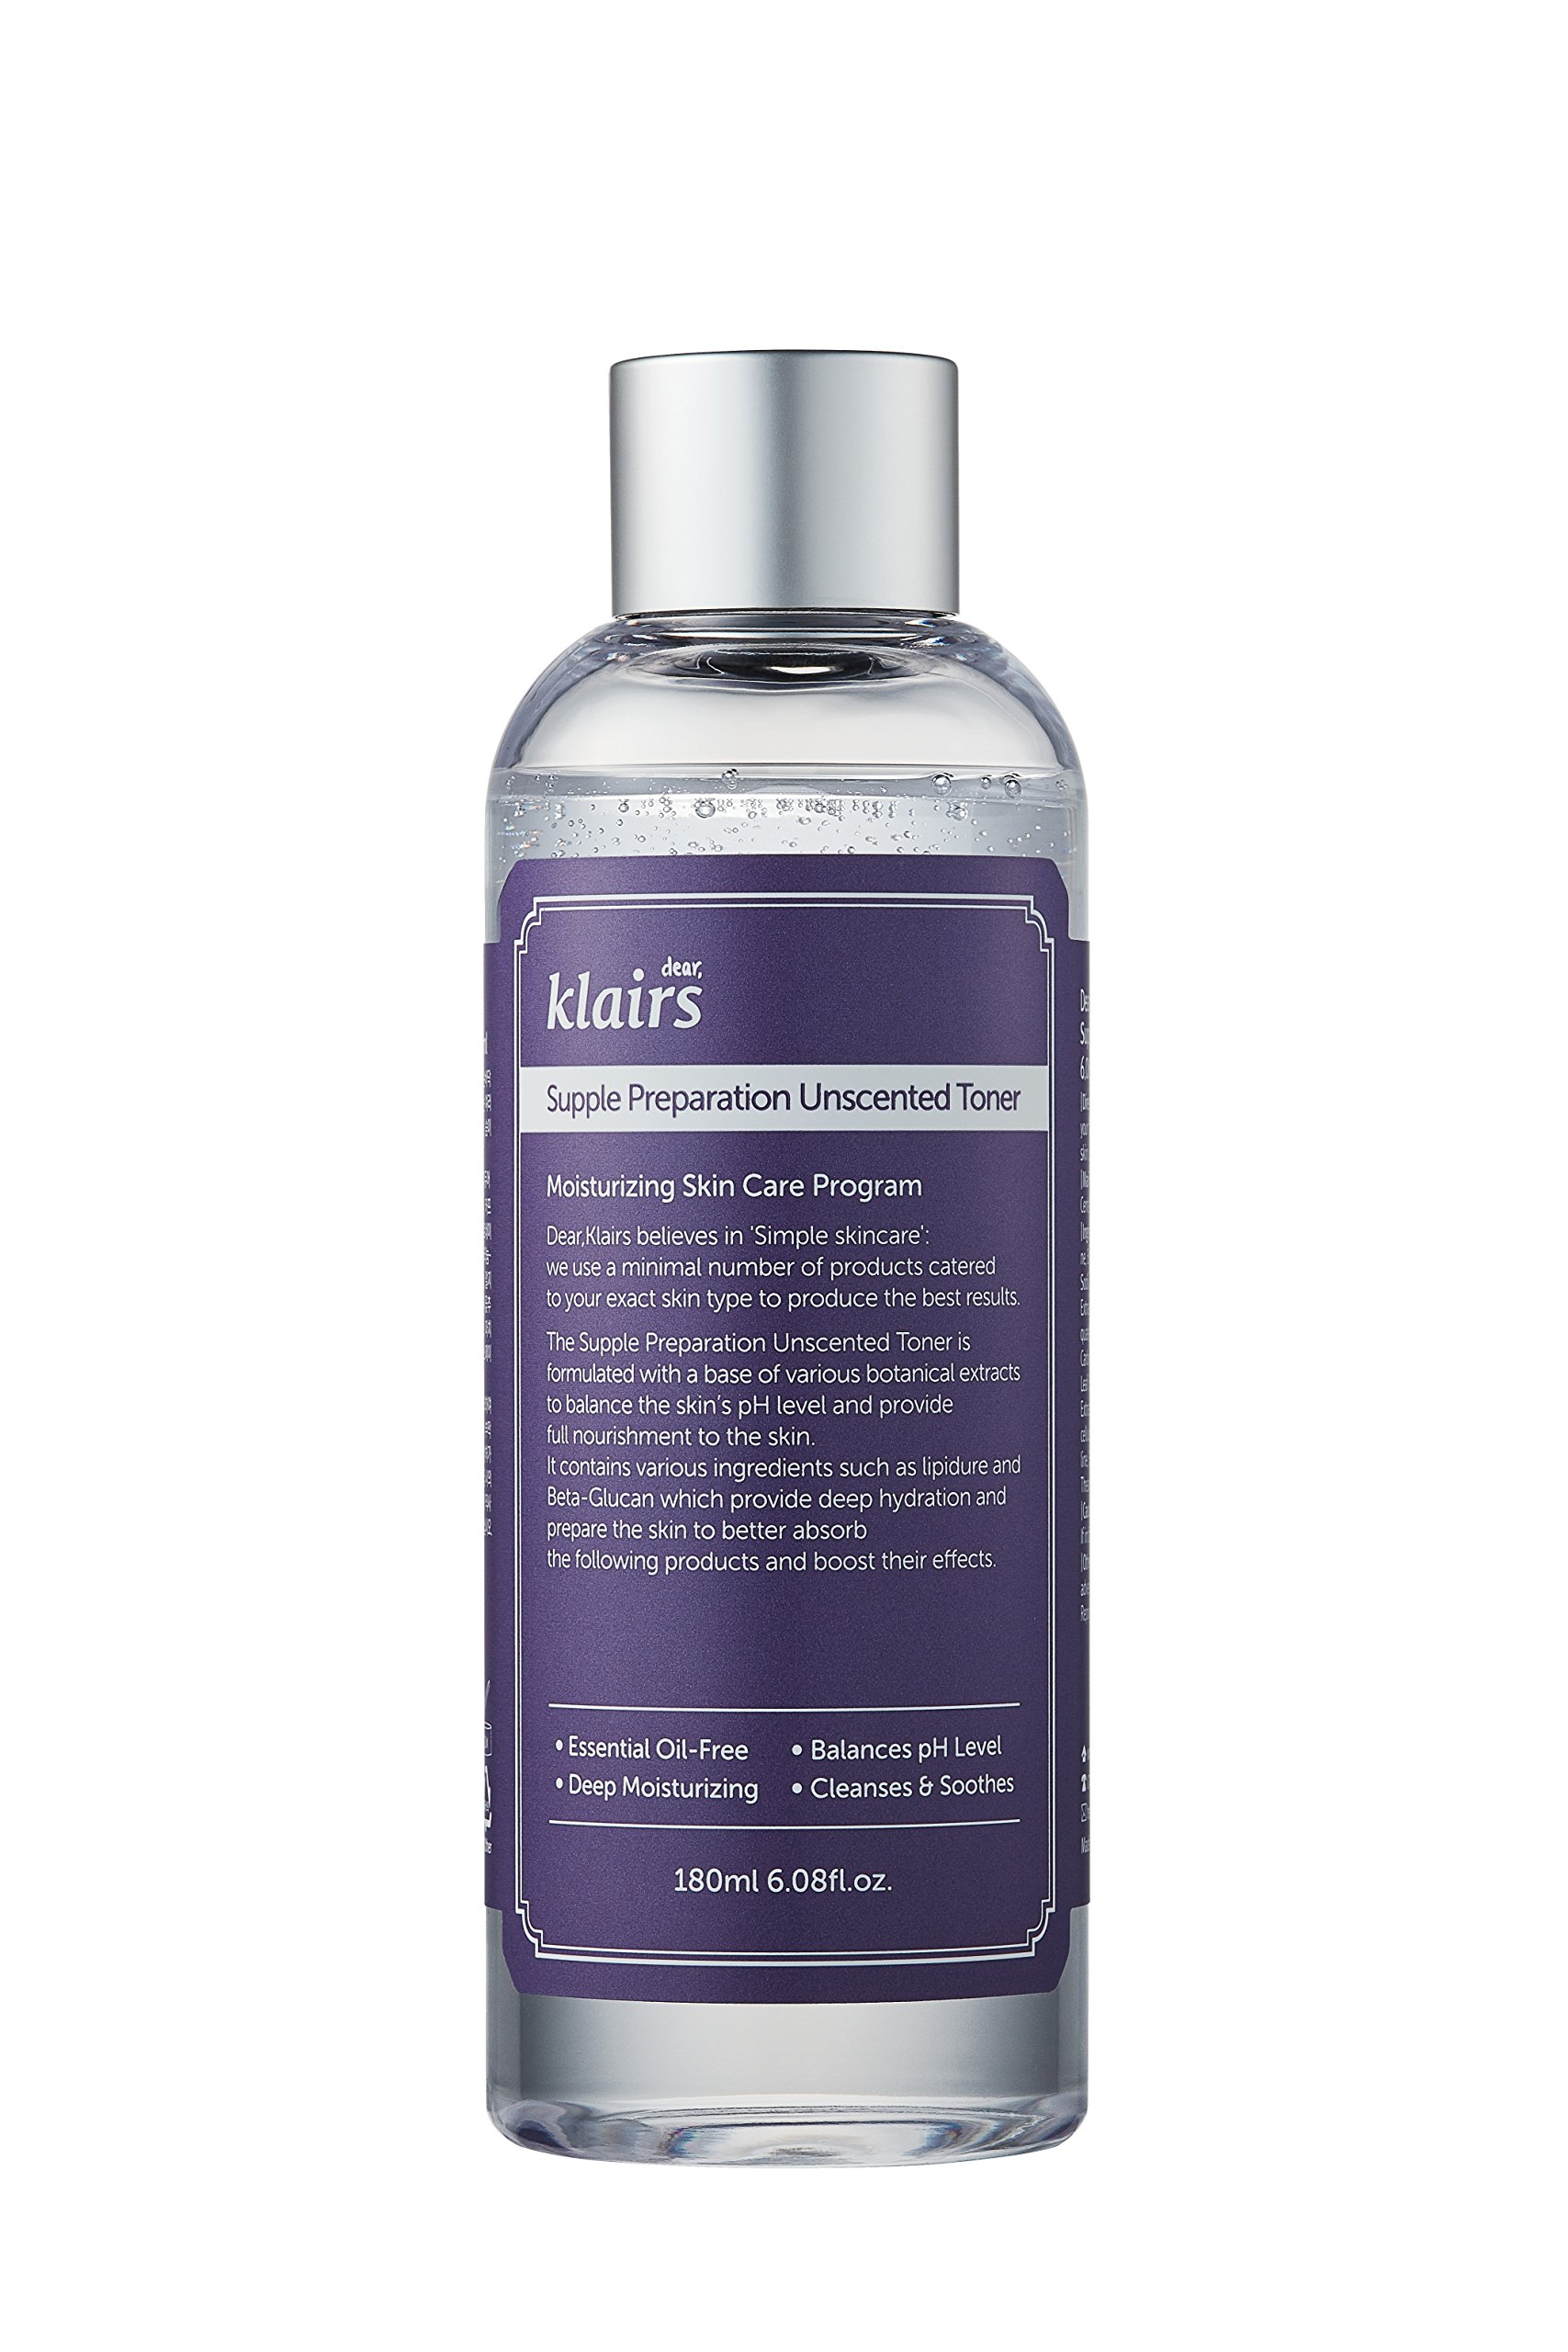 [KLAIRS] Supple Preparation Unscented Toner 180ml lightweight, essential oil-free, alcohol free